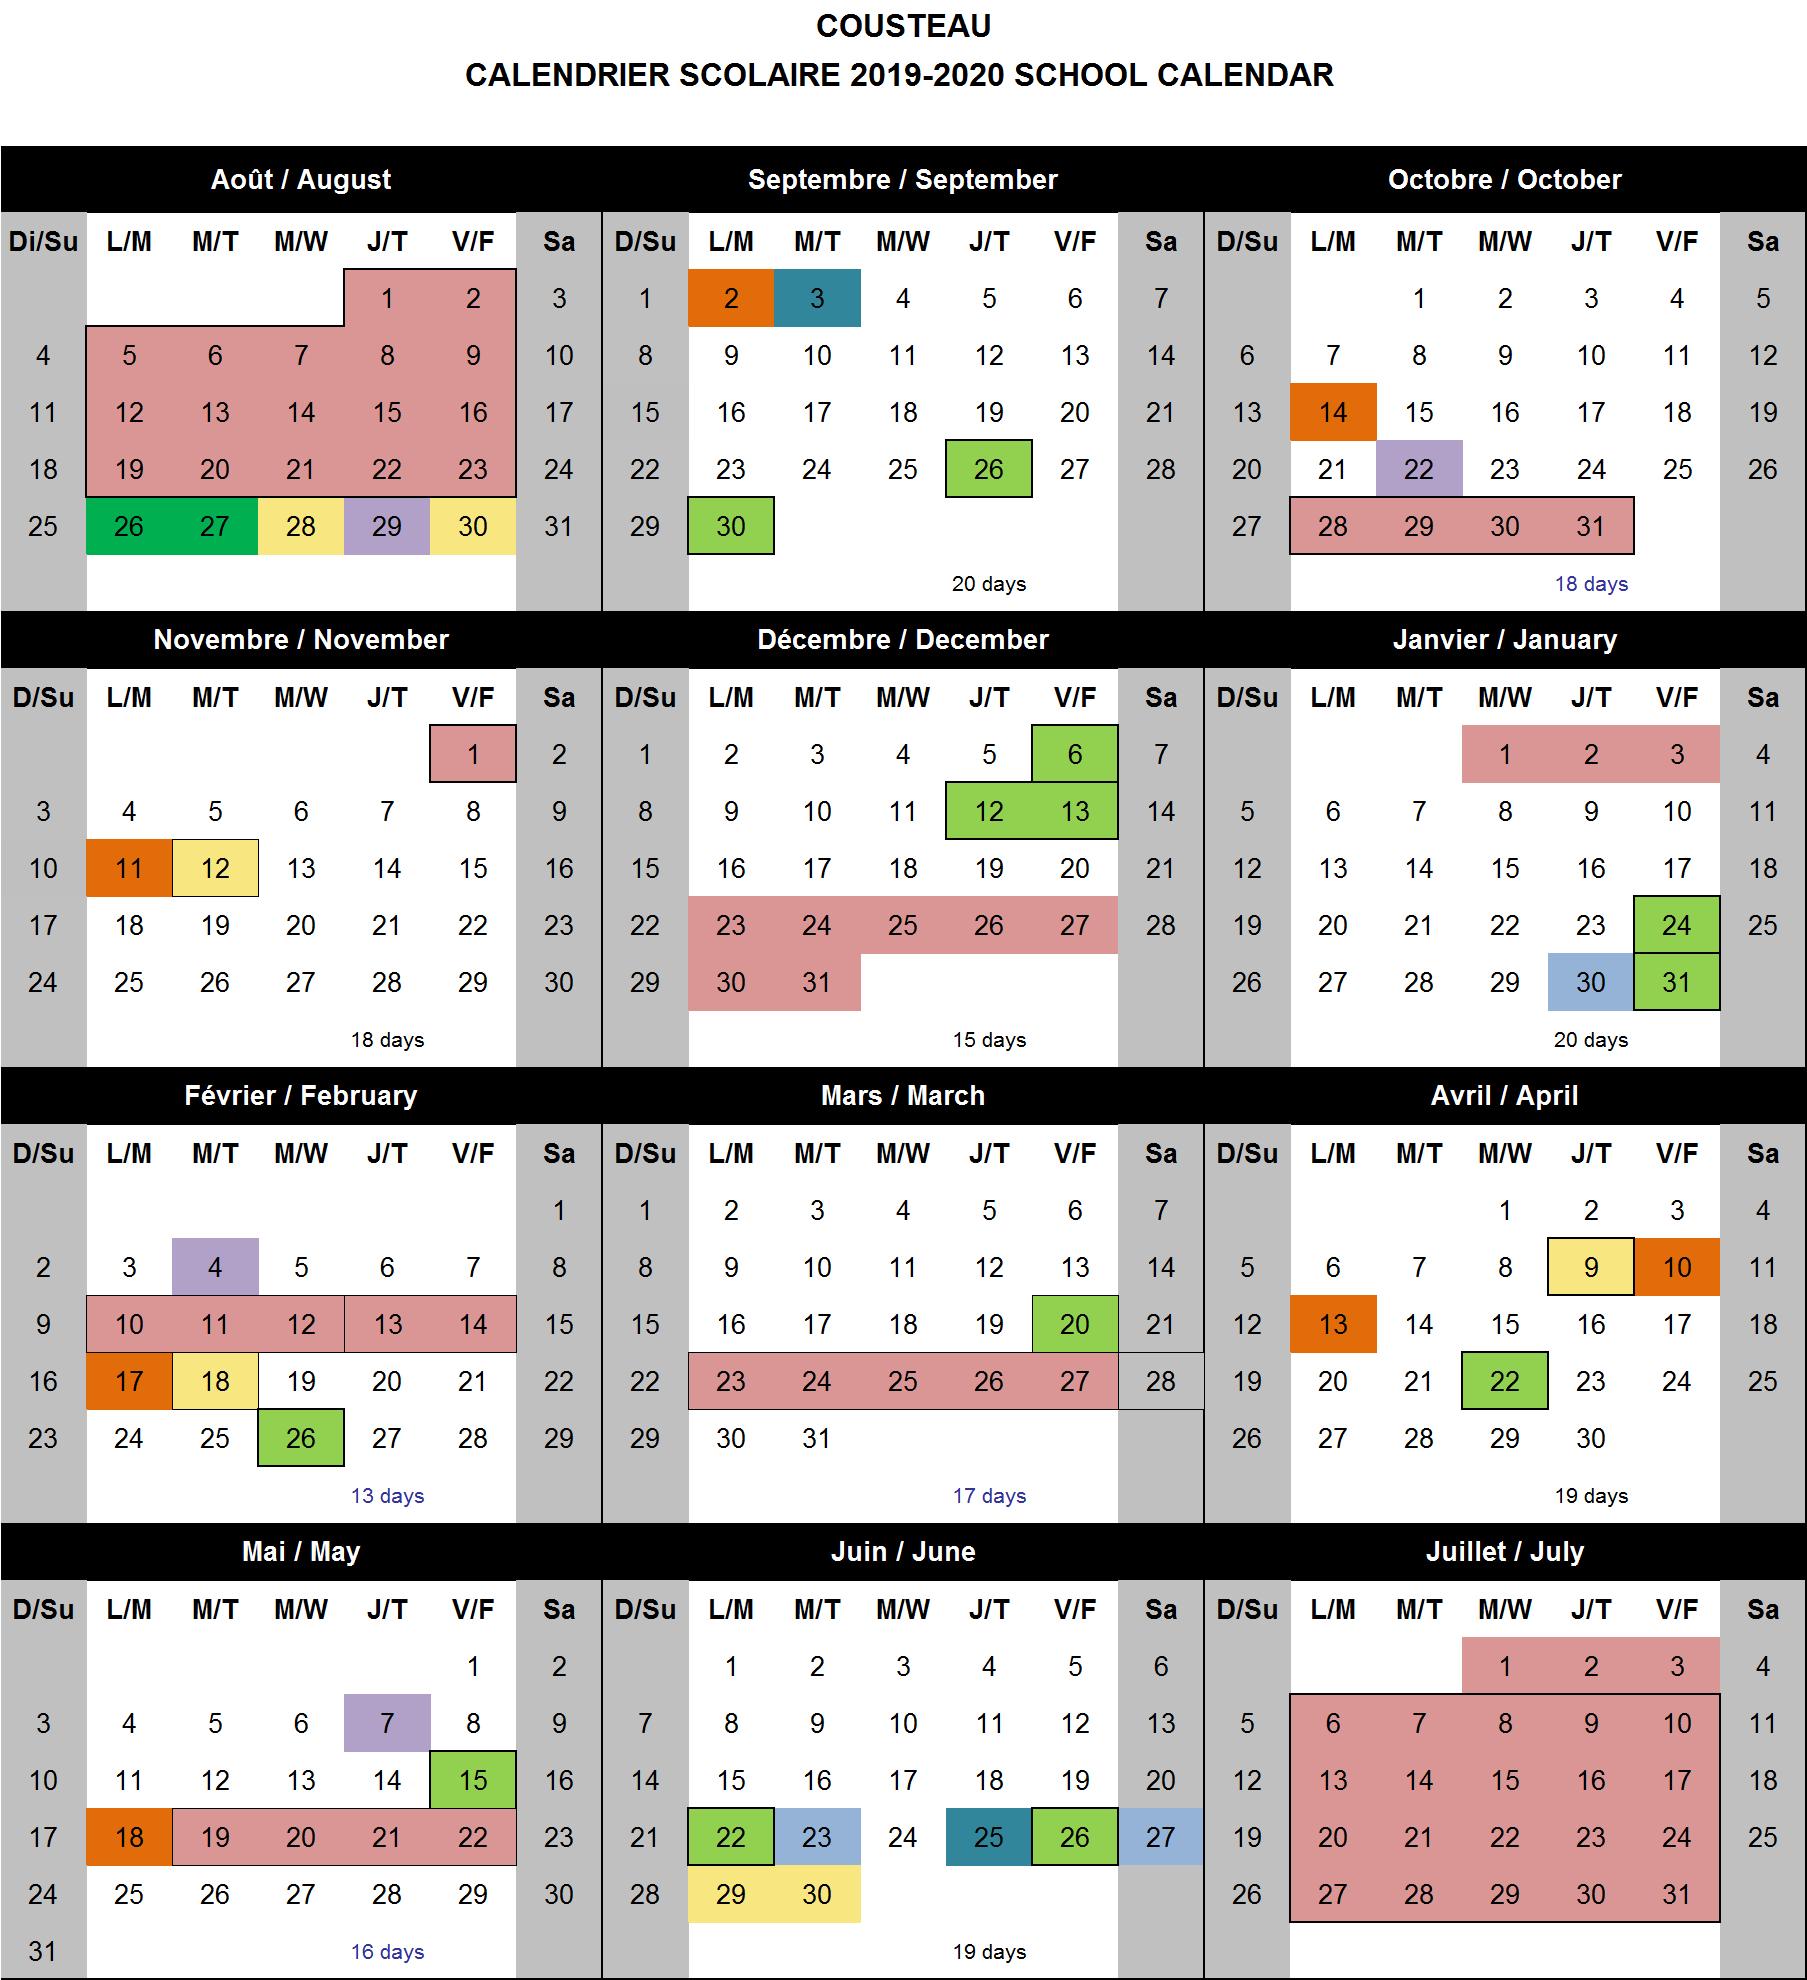 School Calendar  Cousteau School for Mulgrave School Calendar